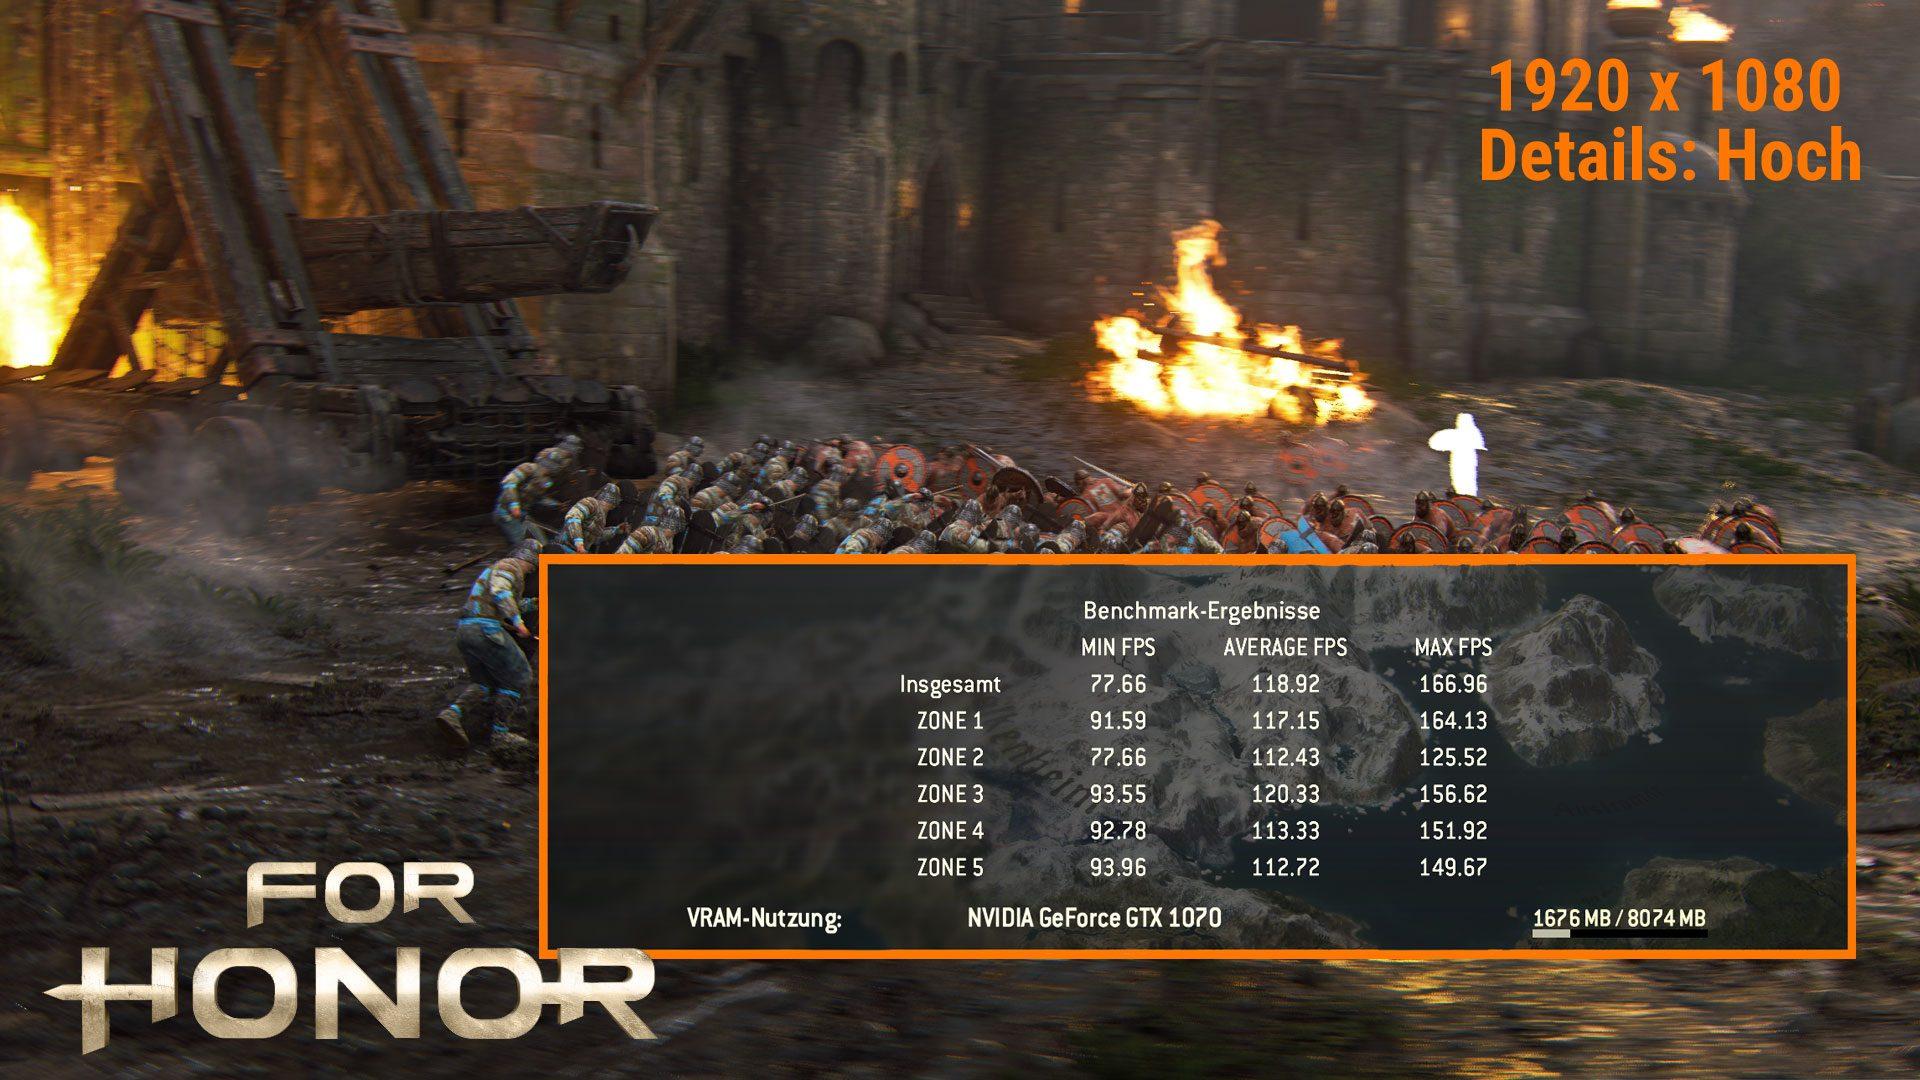 Acer-Predator-17-G9-793-718-Games-6